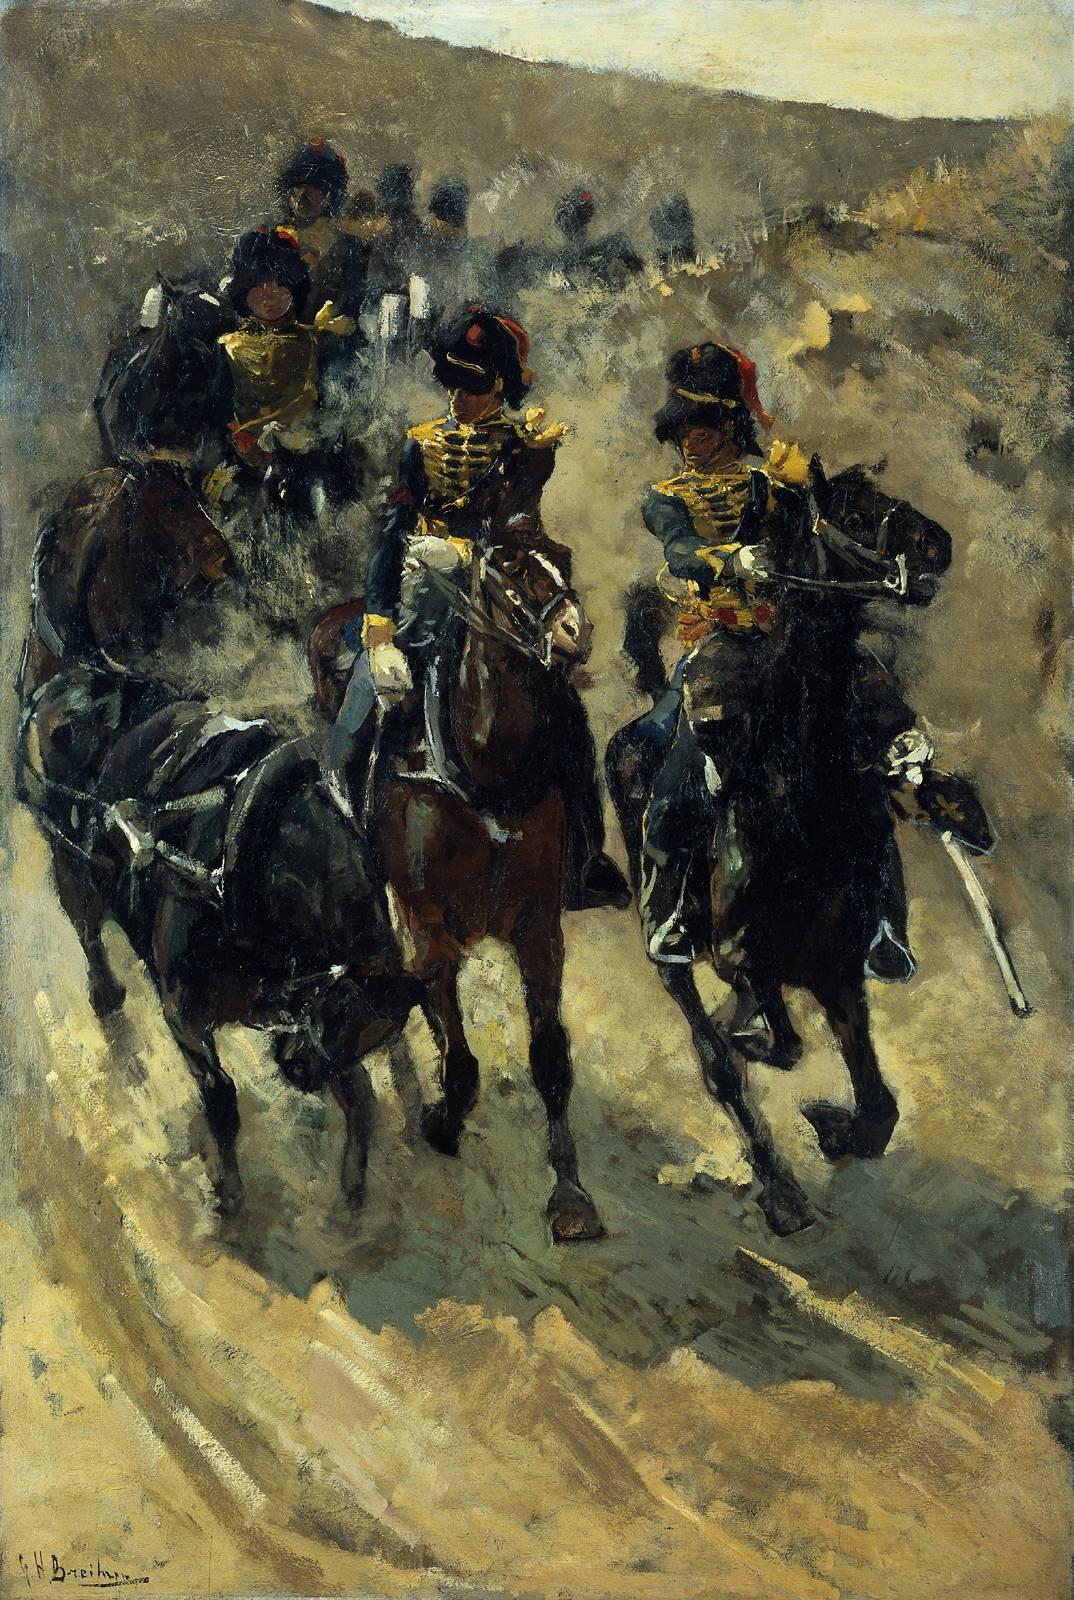 George_Hendrik_Breitner_-_Rijdende_Artillerie